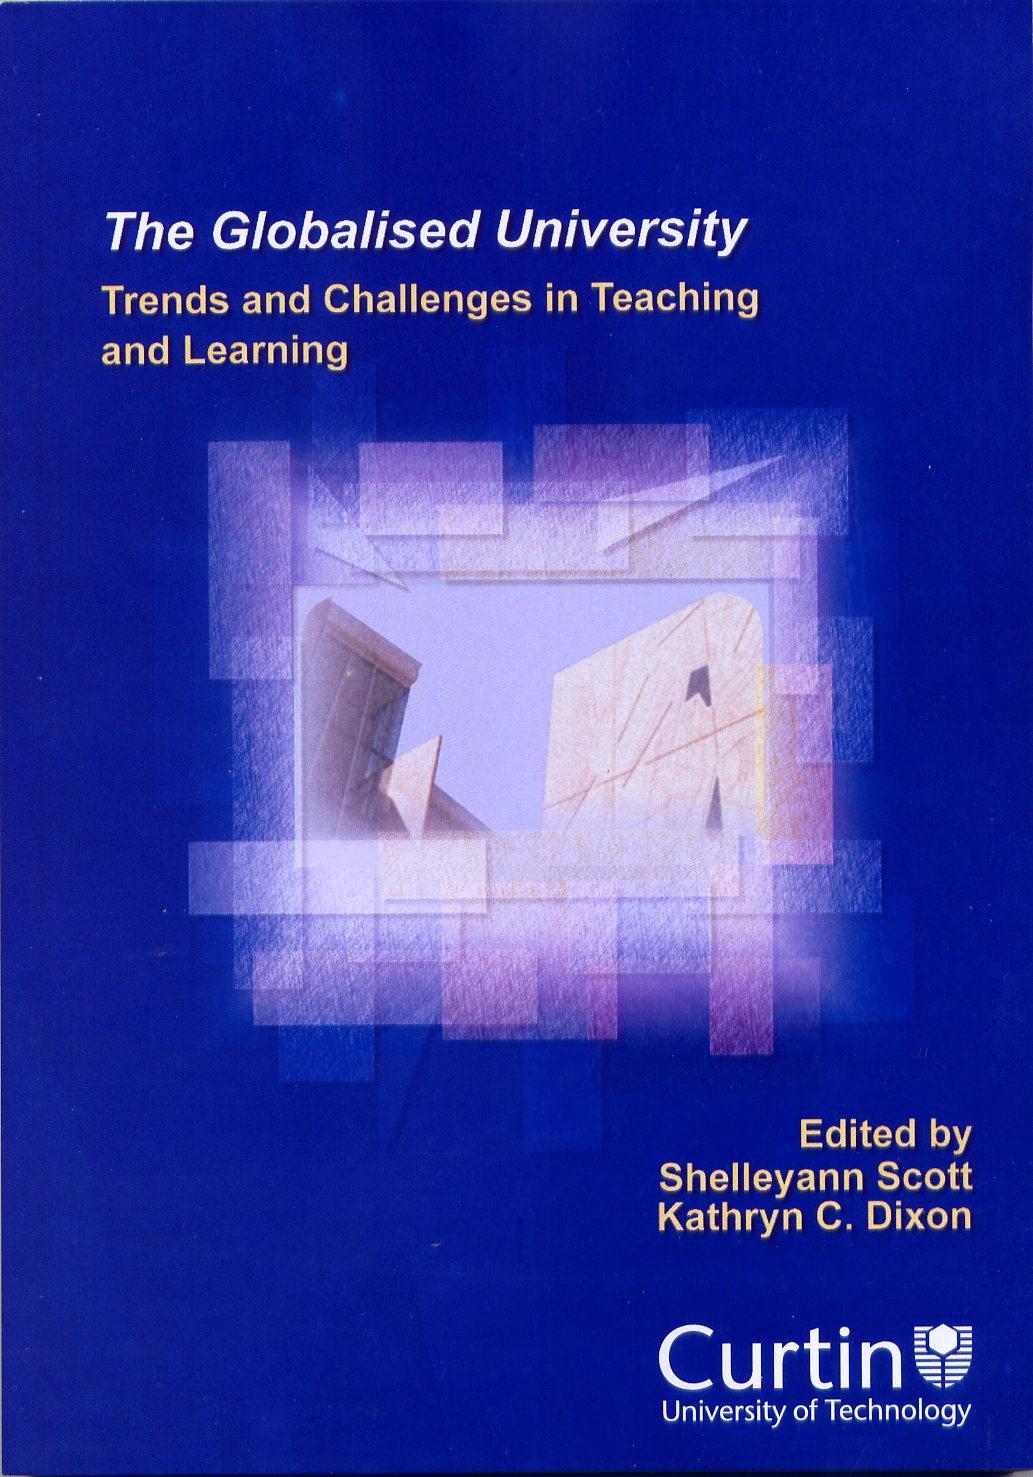 The Globalised University edited by Shelleyann Scott and Kathryn C Dixon